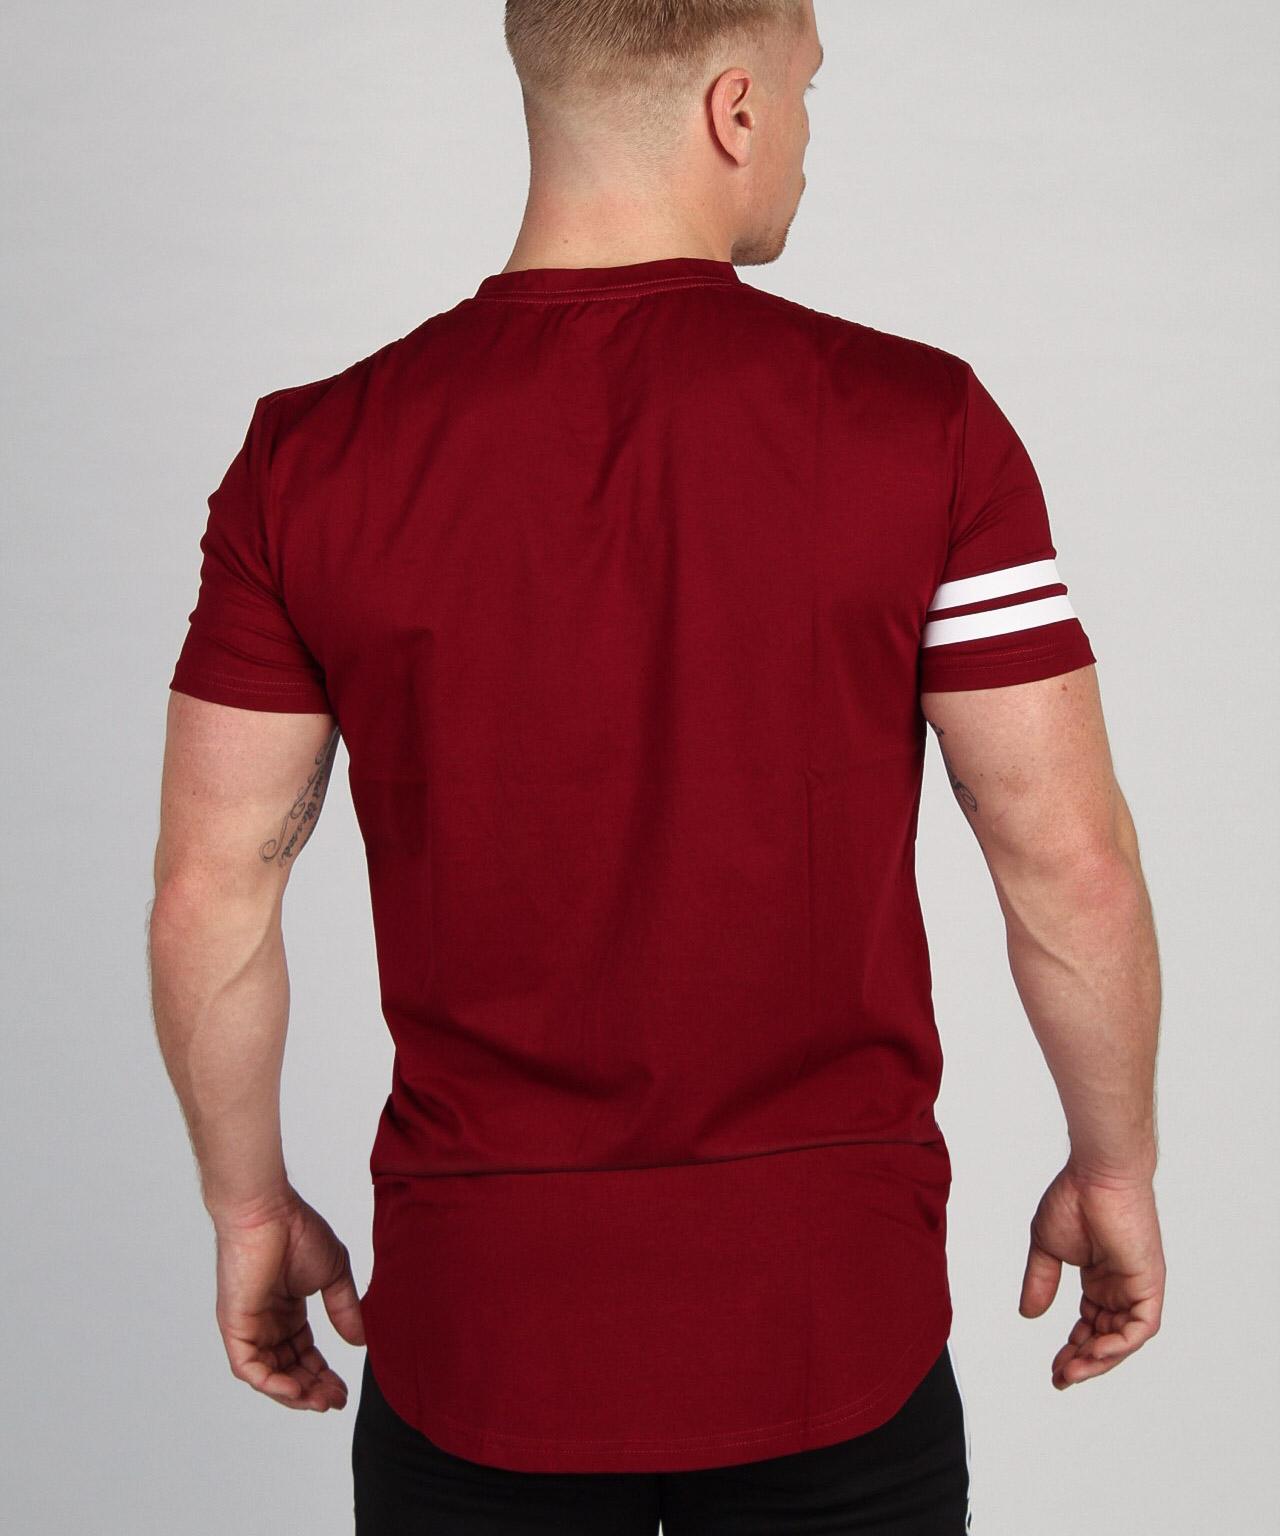 Shaped Striped T-shirt Burgundy